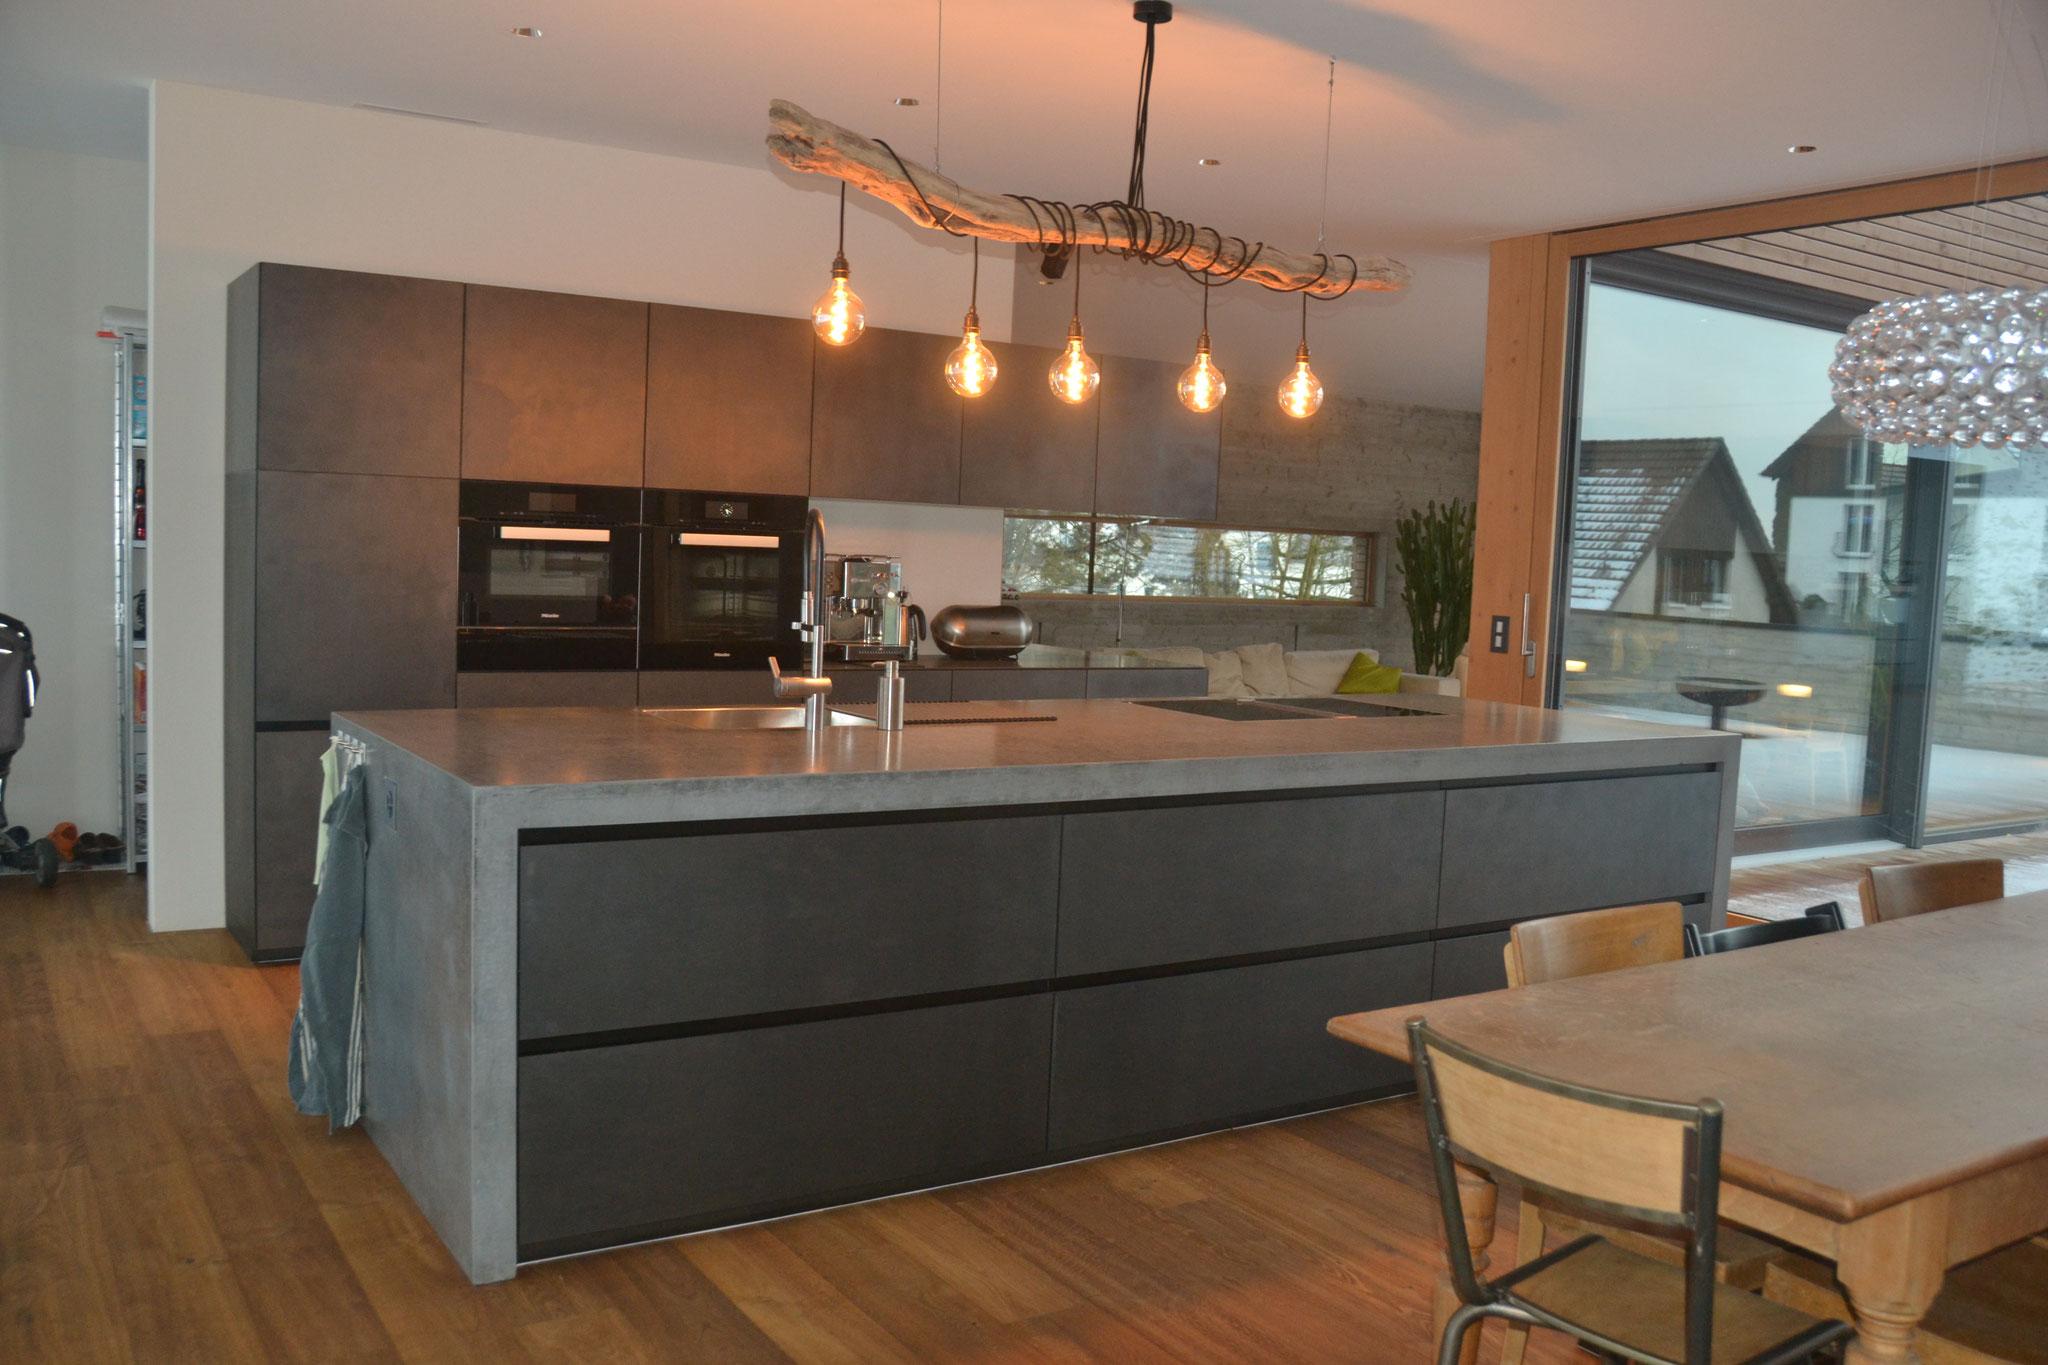 Betonküche - Nonnast raum&beton design